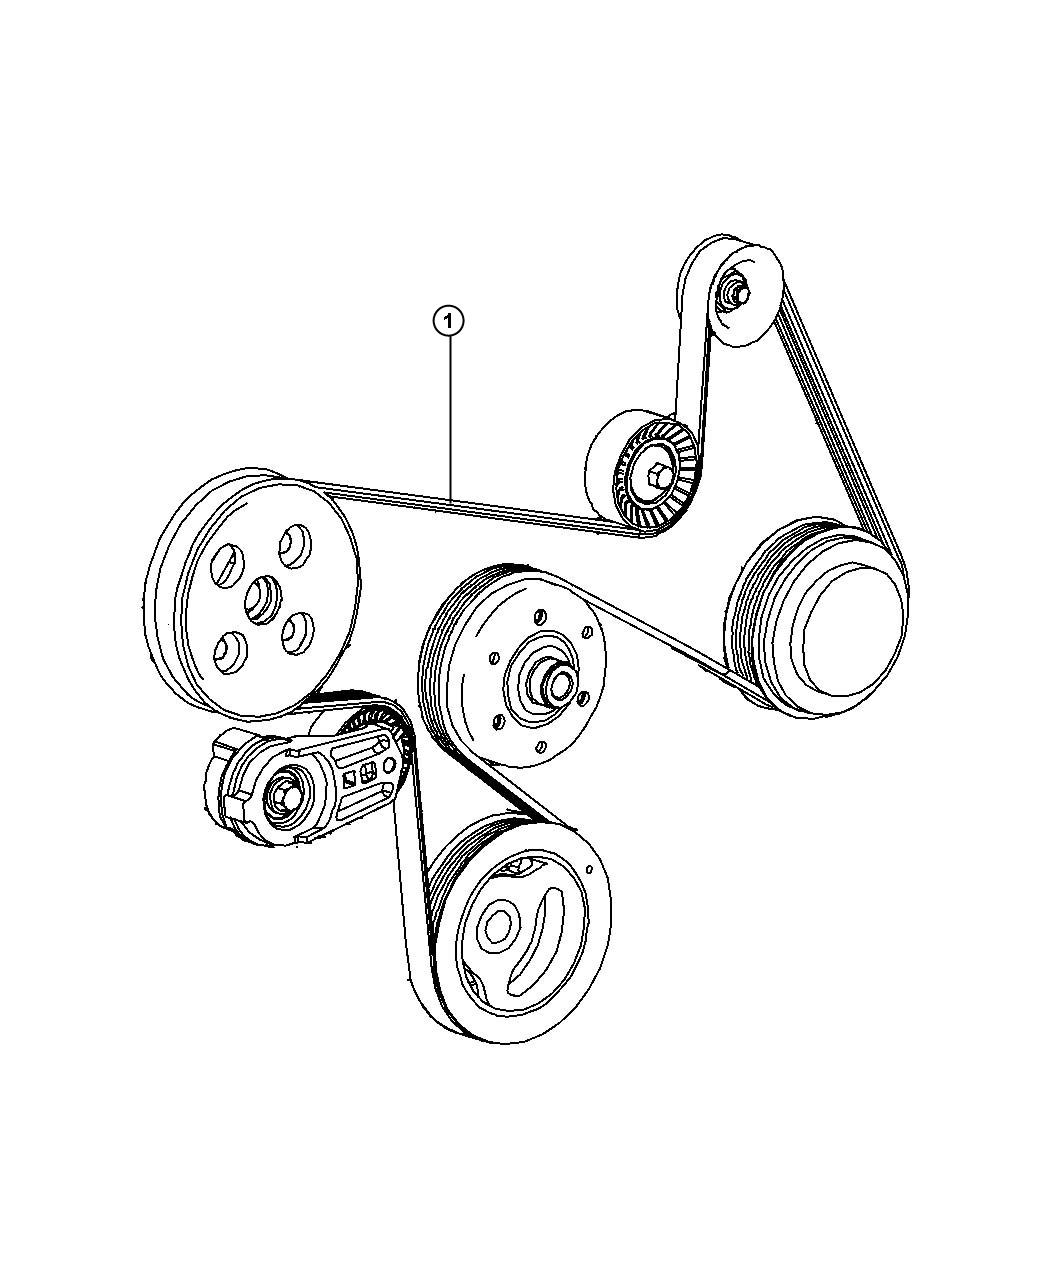 2010 Jeep Wrangler Belt. A/c compressor, accessory drive